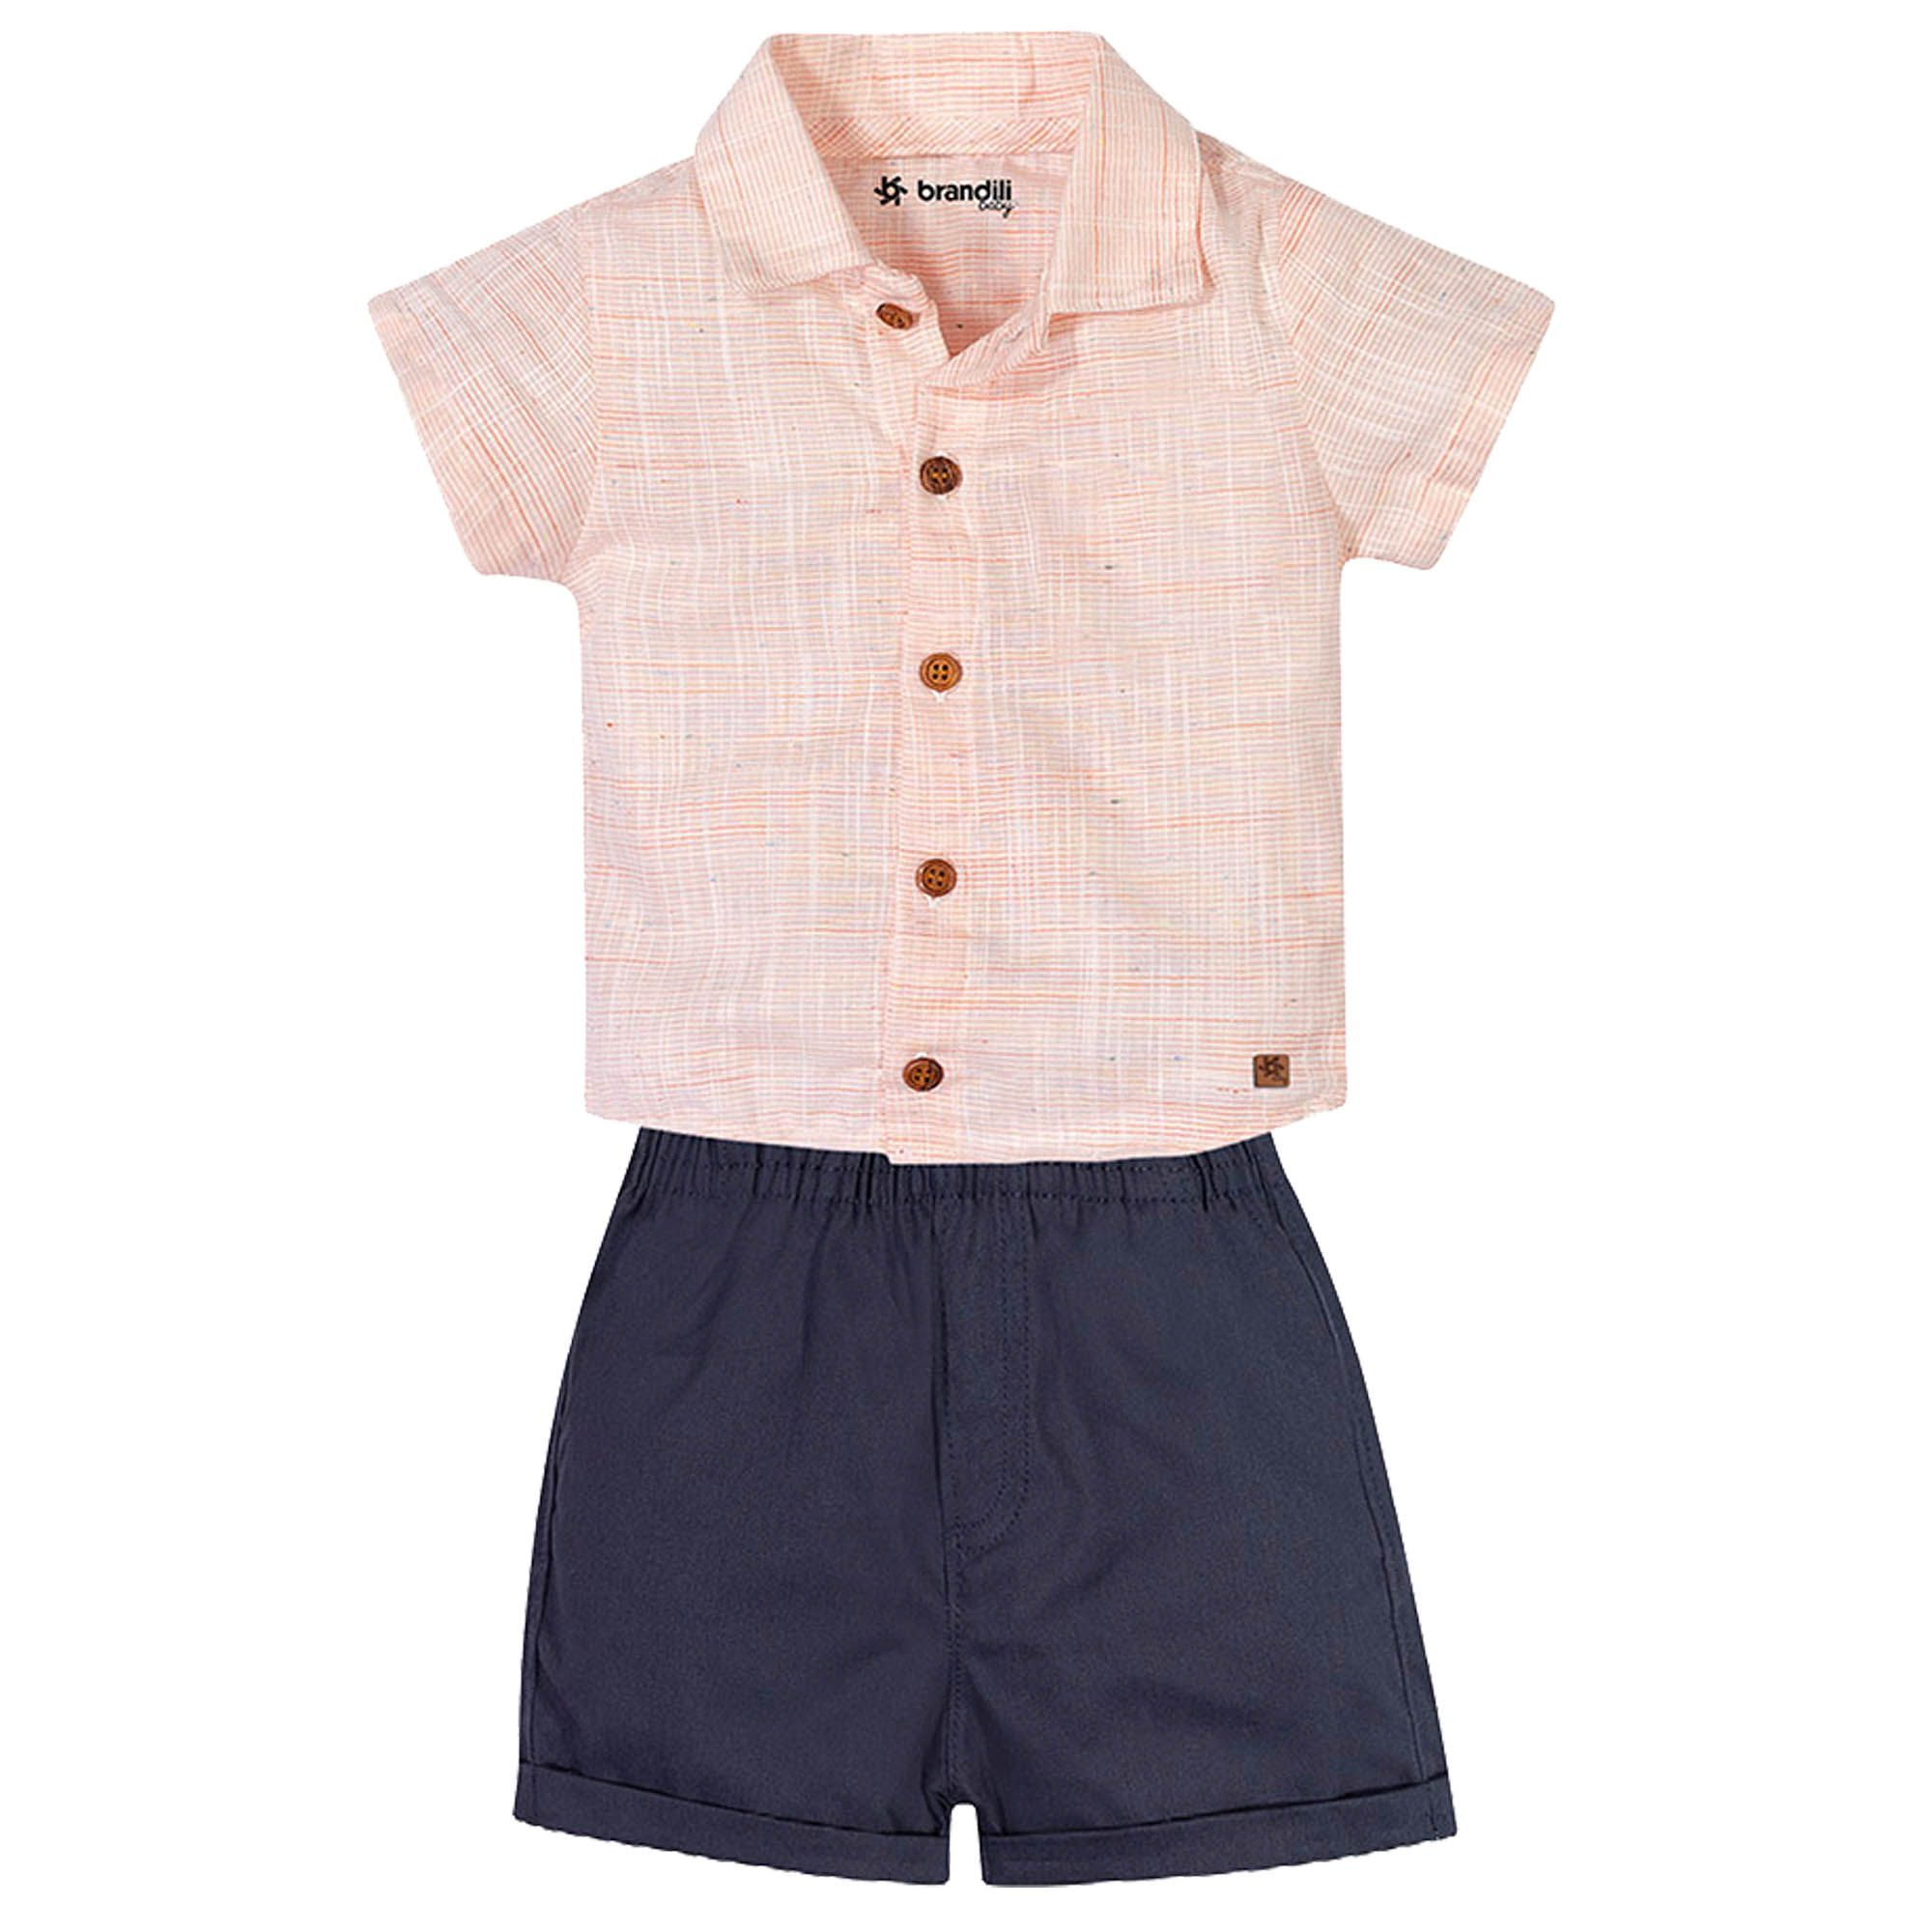 Conjunto Verão Brandili Baby Camisa e Bermuda lisa - P ao G